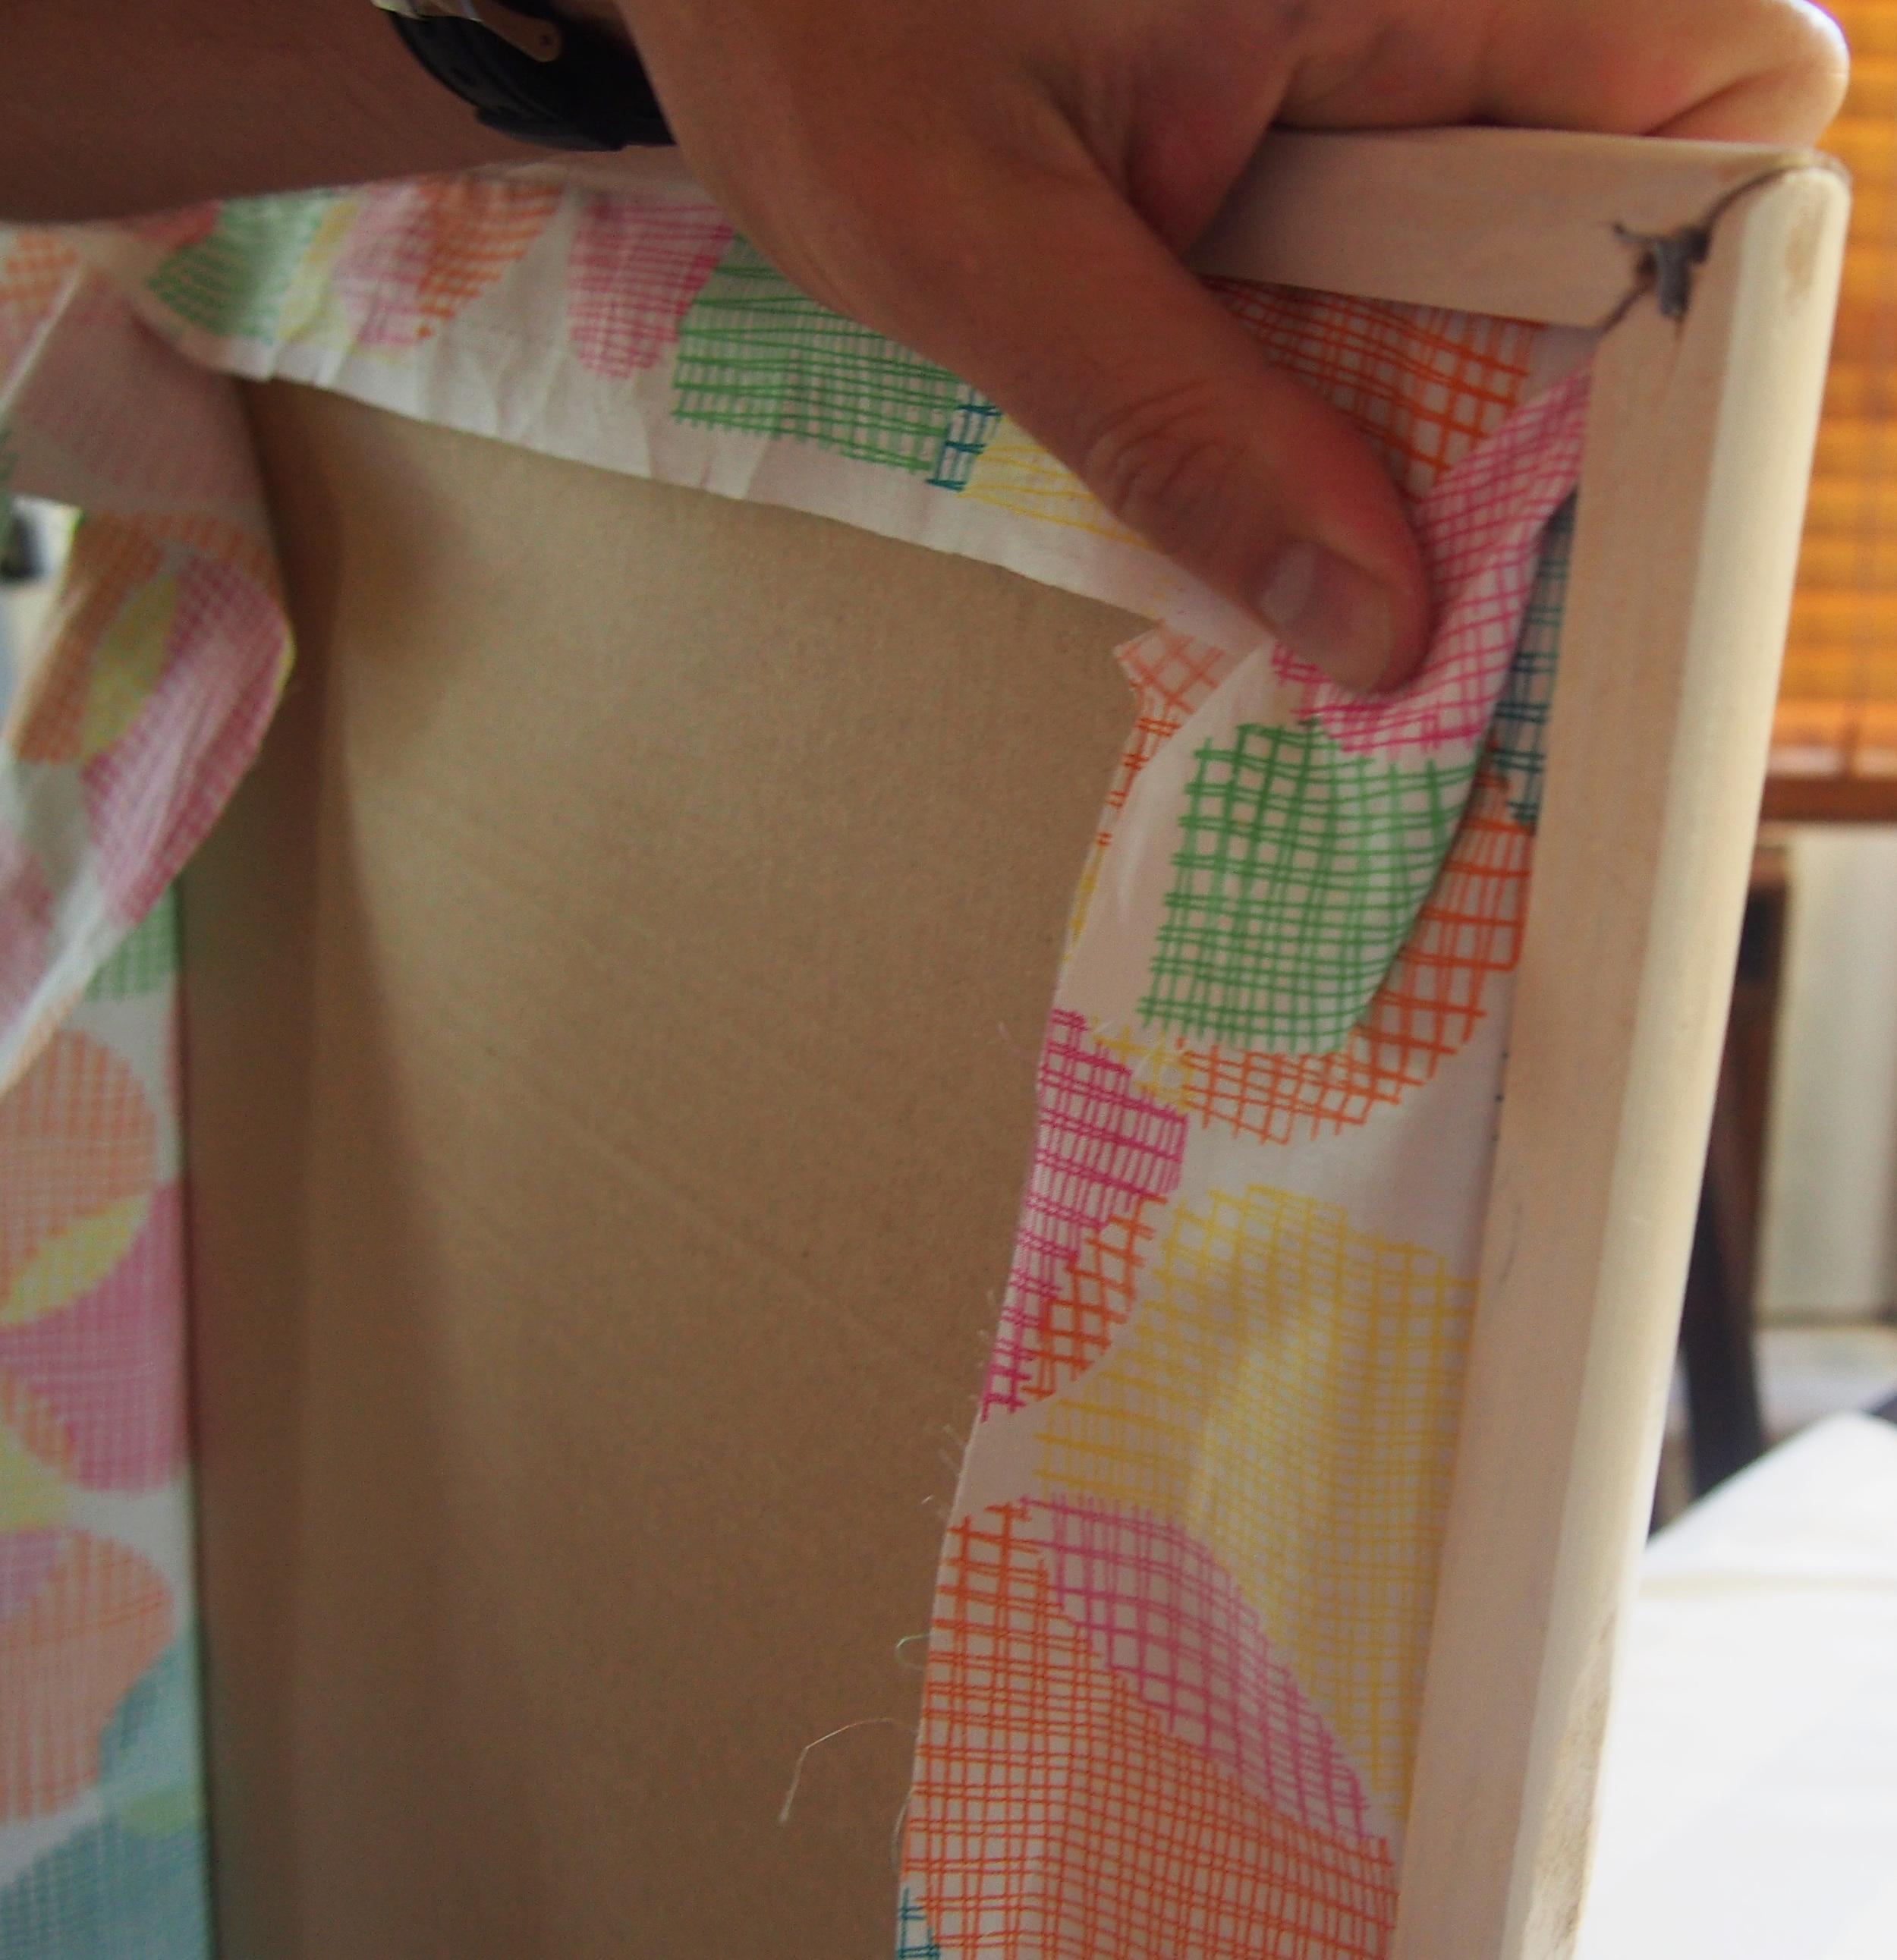 pinning material corners onto cork board